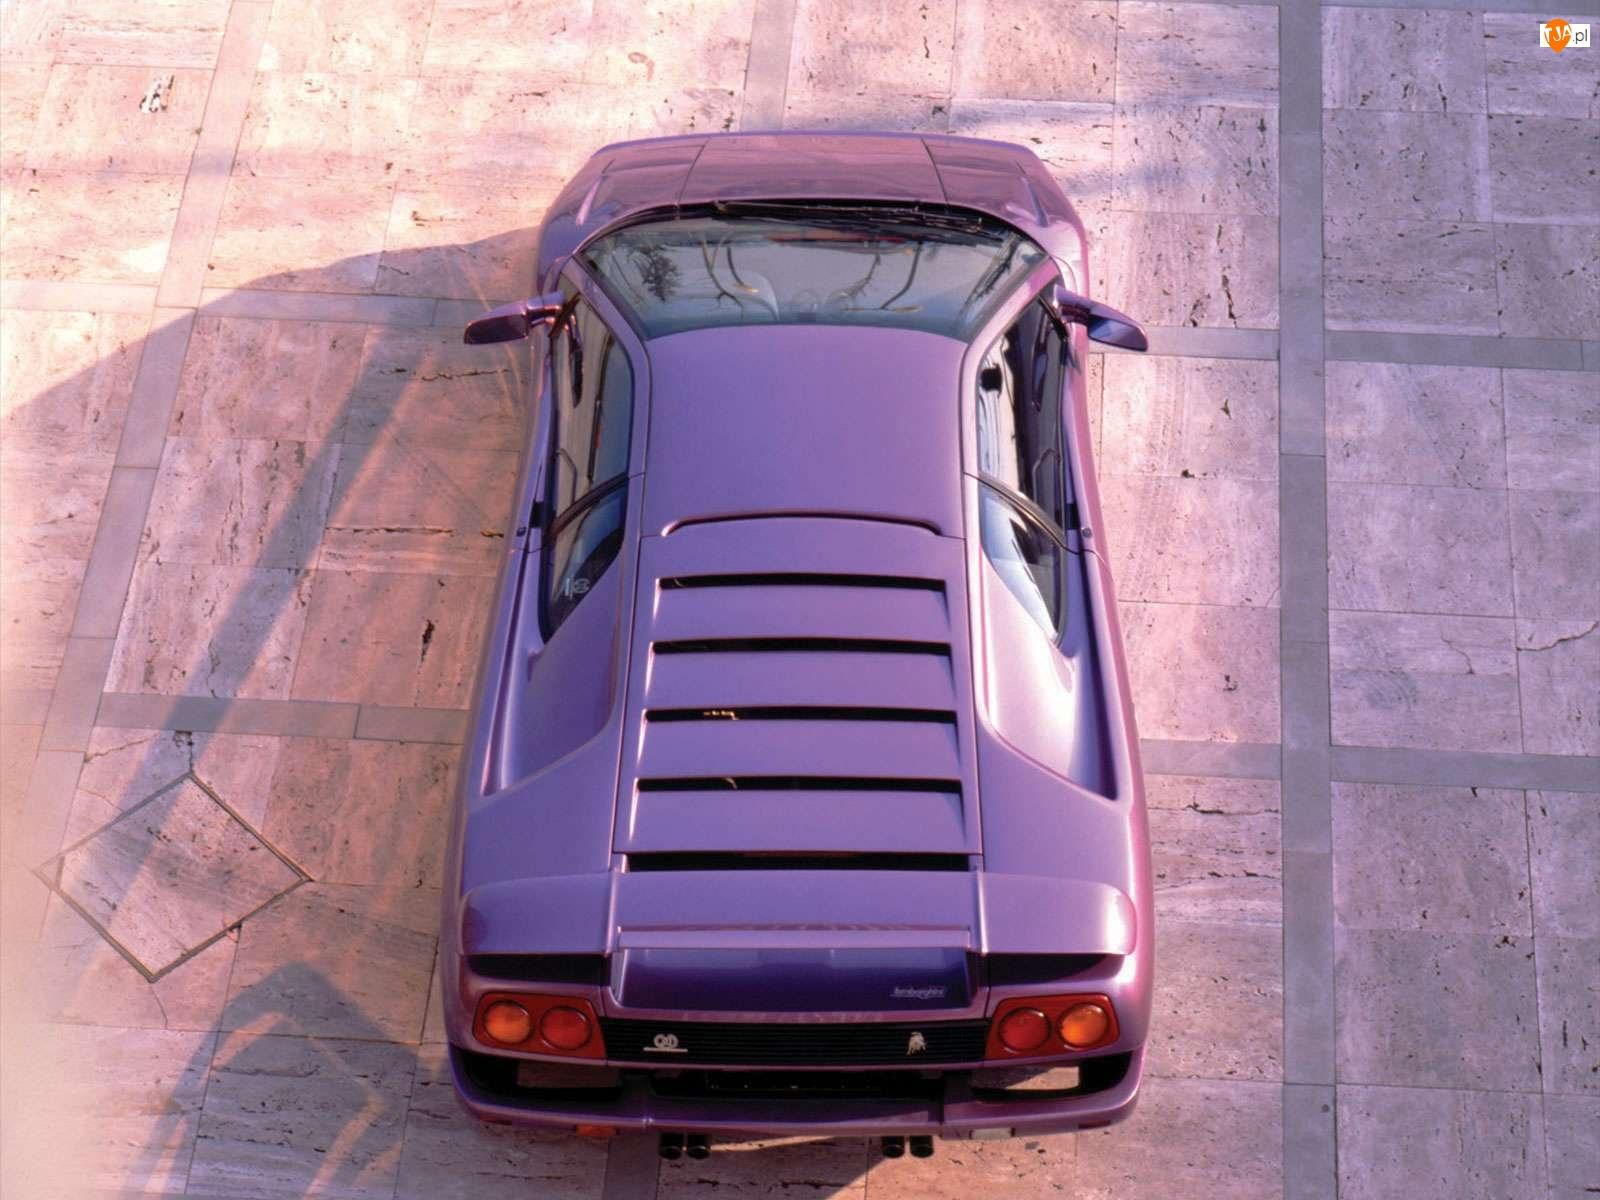 Silnika, Lamborghini Diablo, Pokrywa